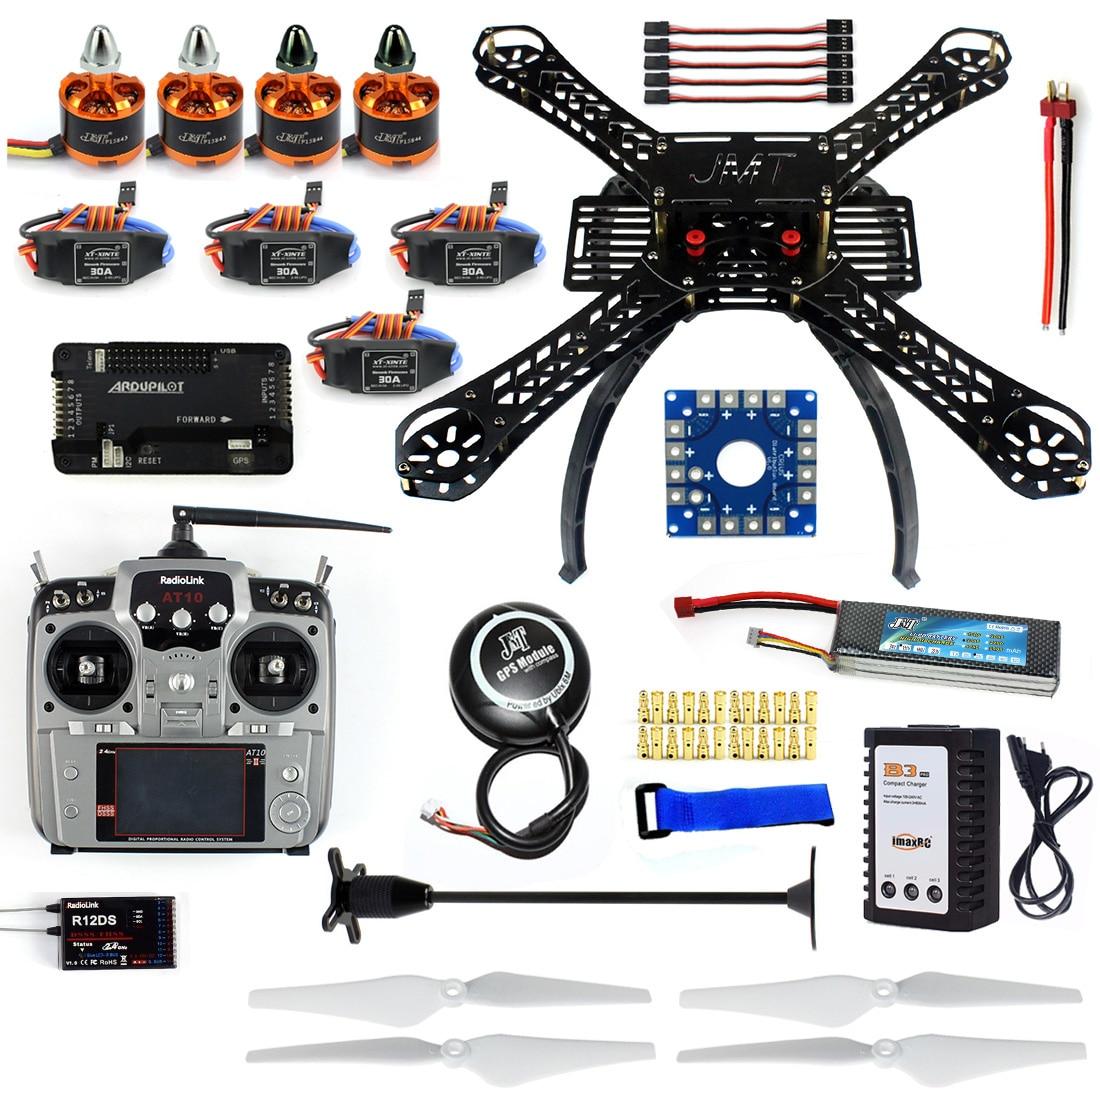 F14893-N Full Kit DIY RC Drone Quadrocopter X4M380L Frame Kit APM2.8 GPS AT10 TX цена